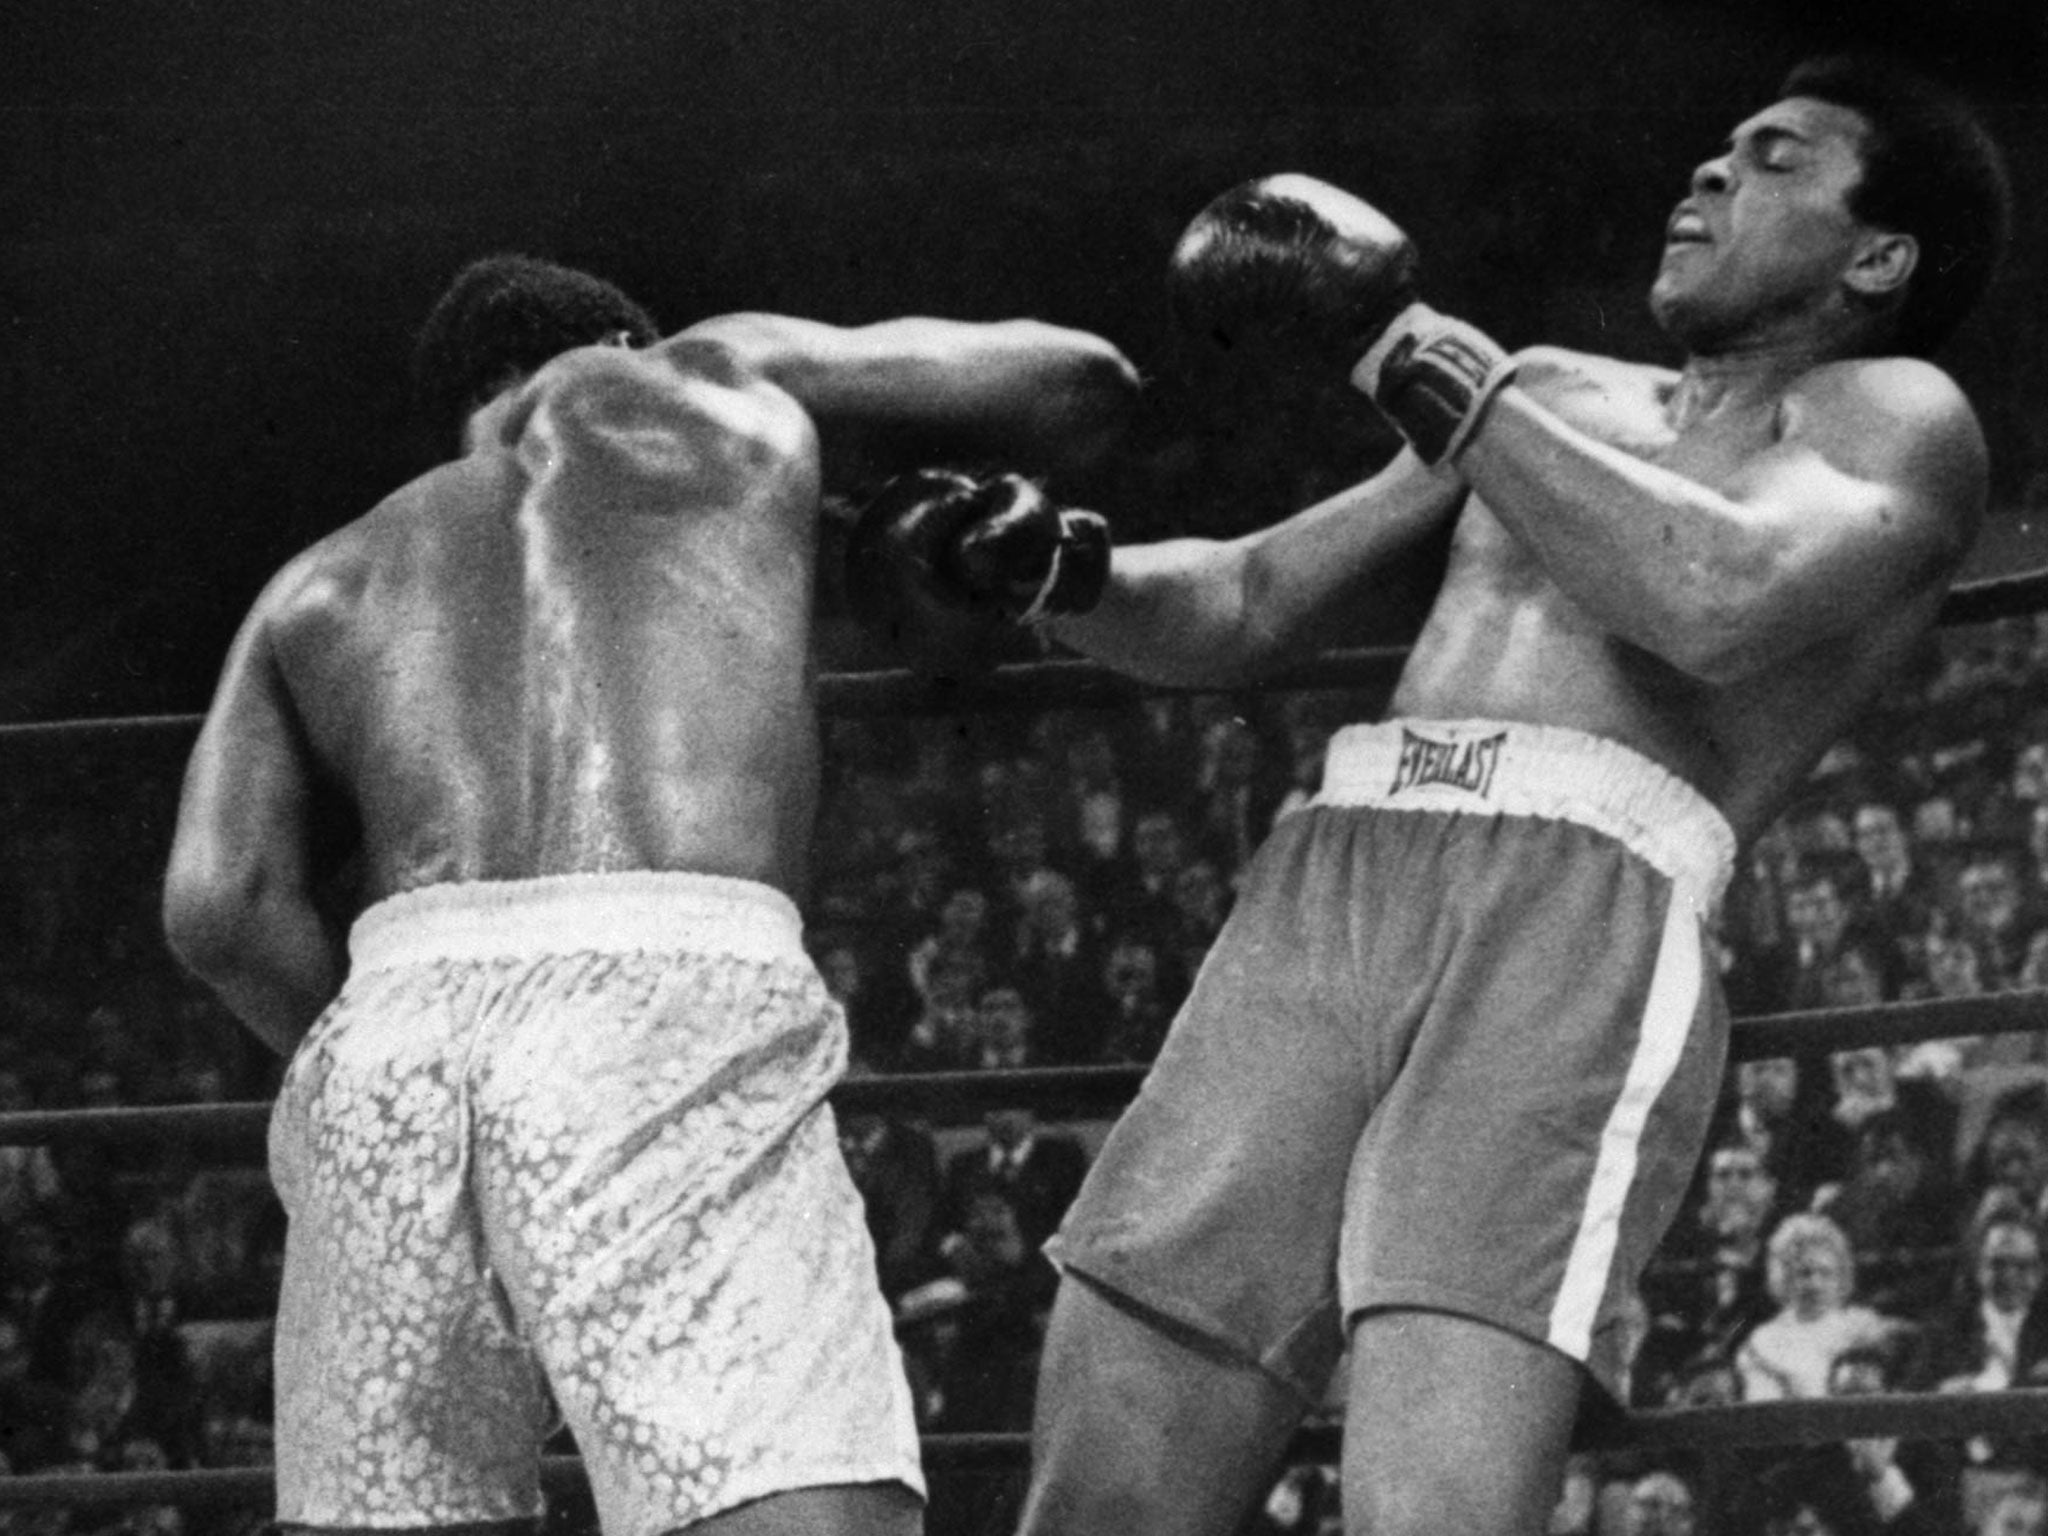 Joe Frazier L Fighting Against Muhammad Ali